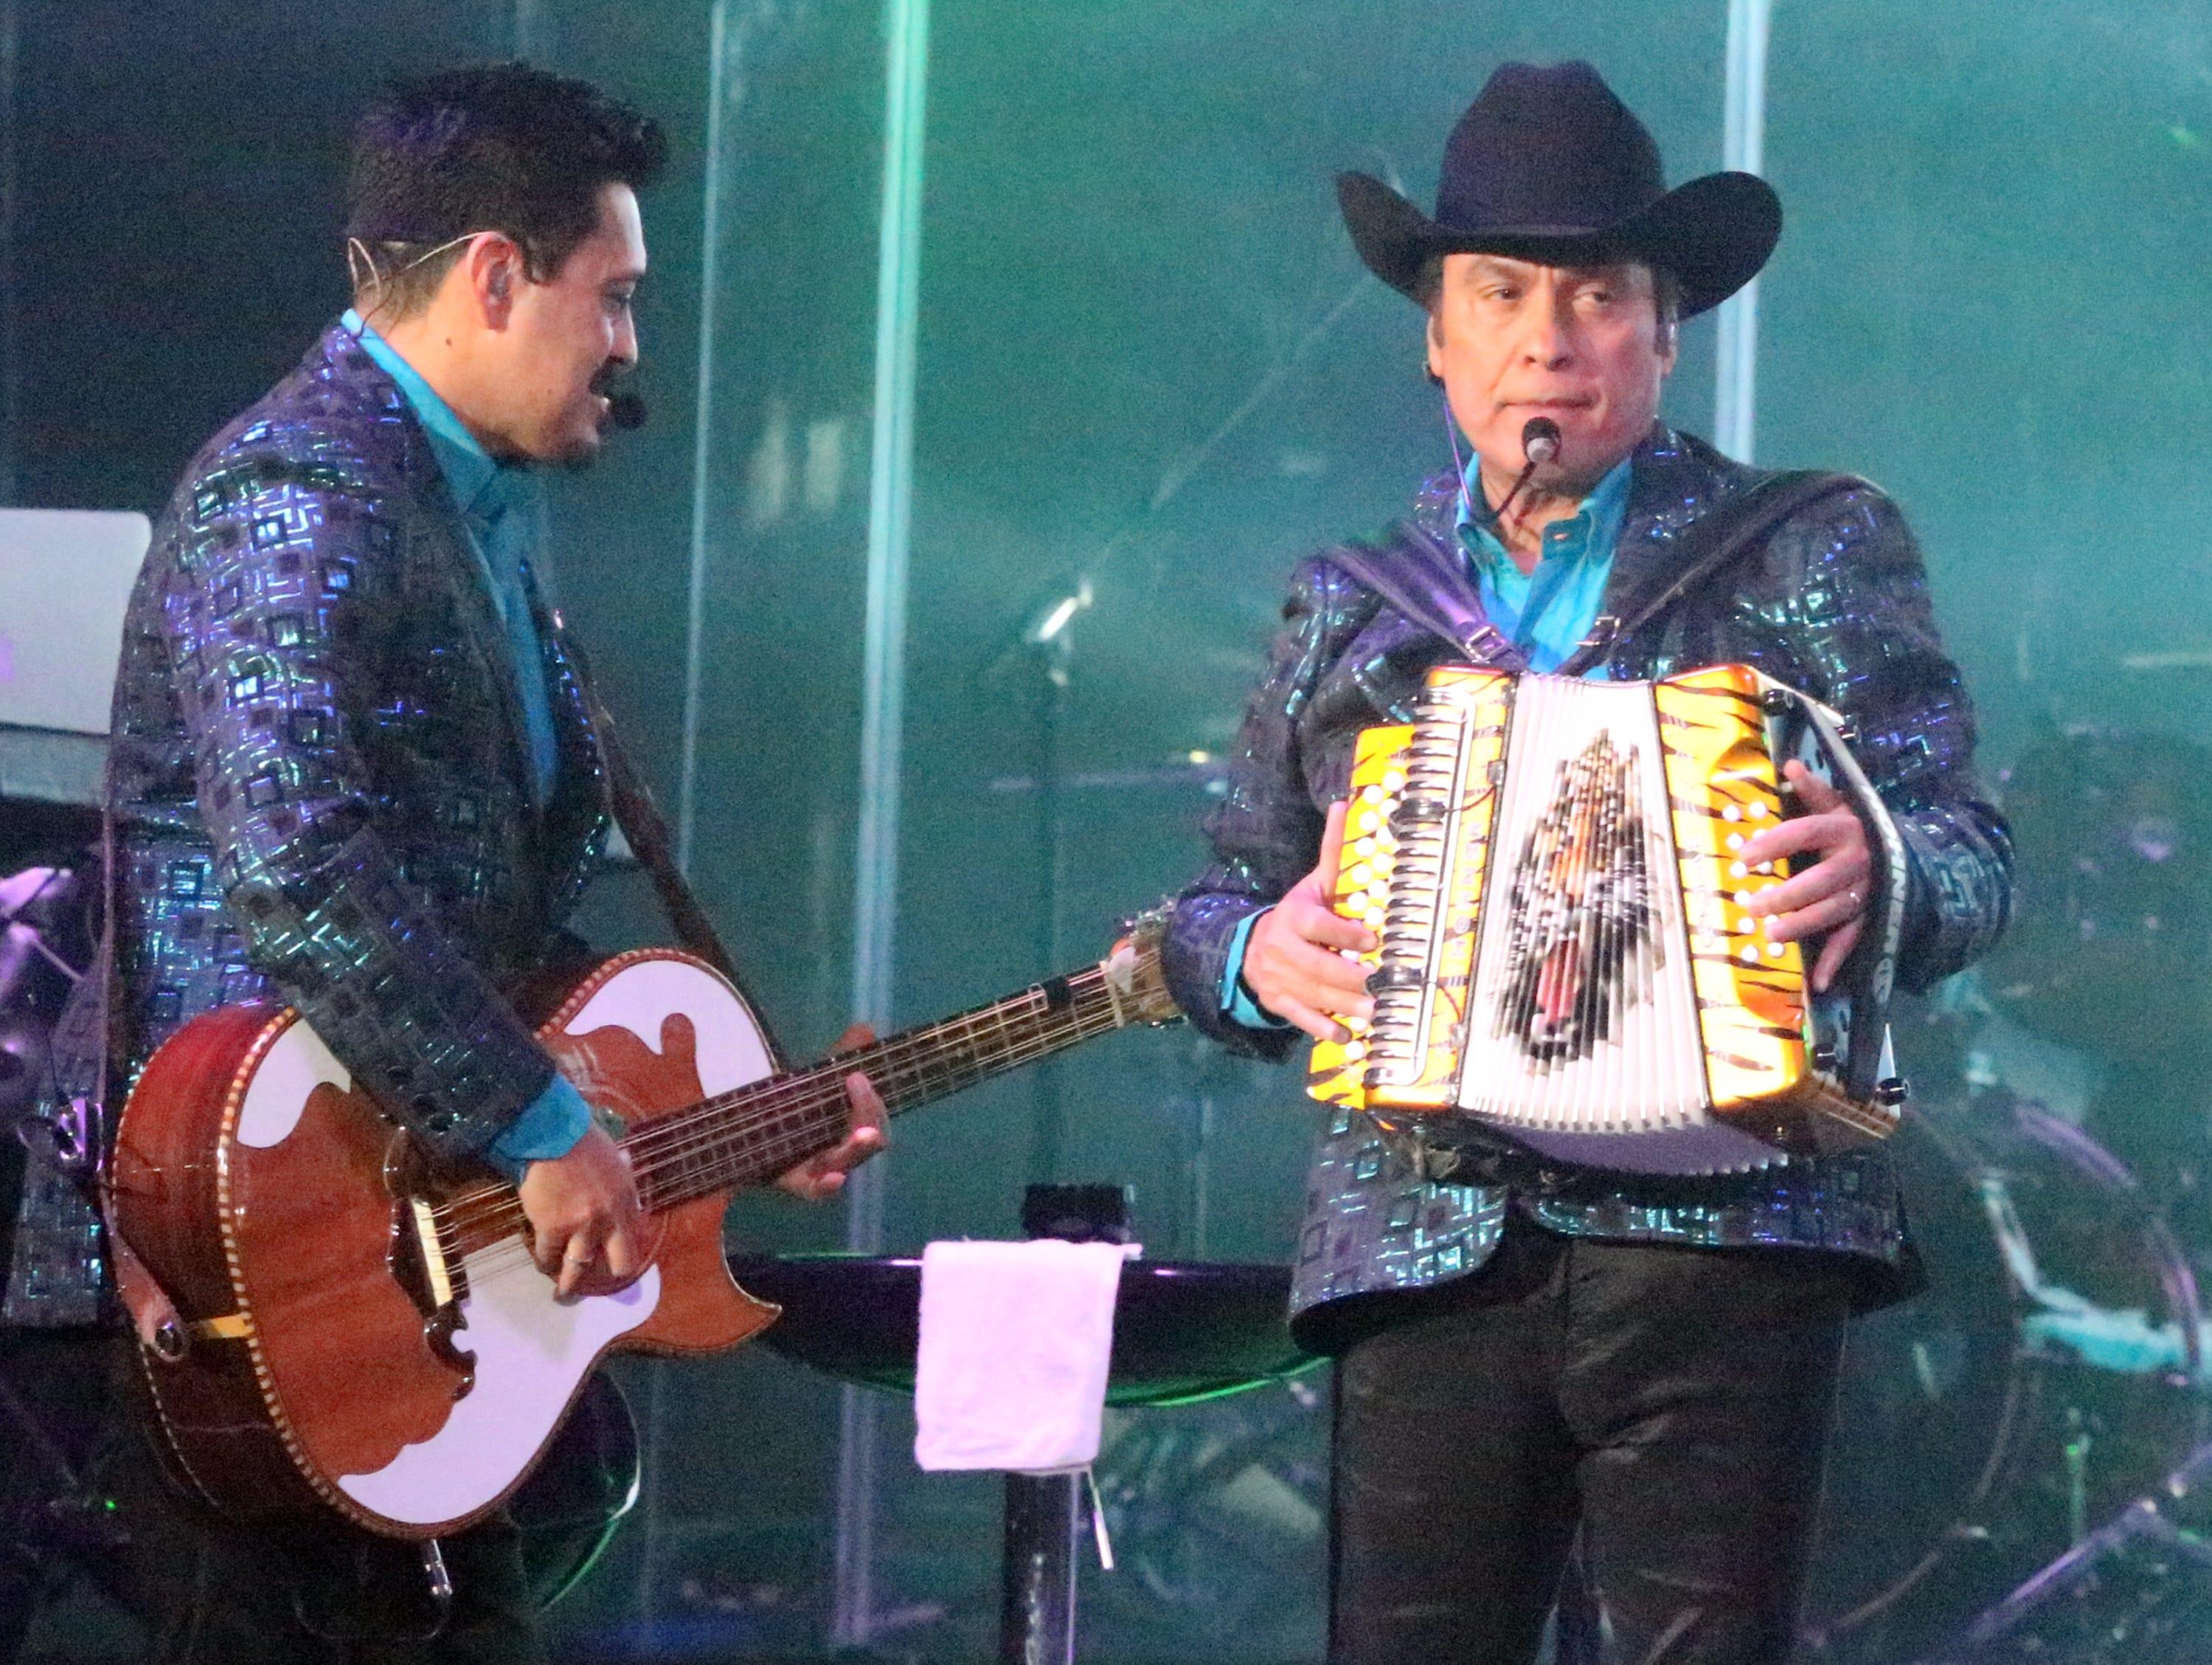 Los Tigres del Norte performed Saturday night in the Don Haskins Center.